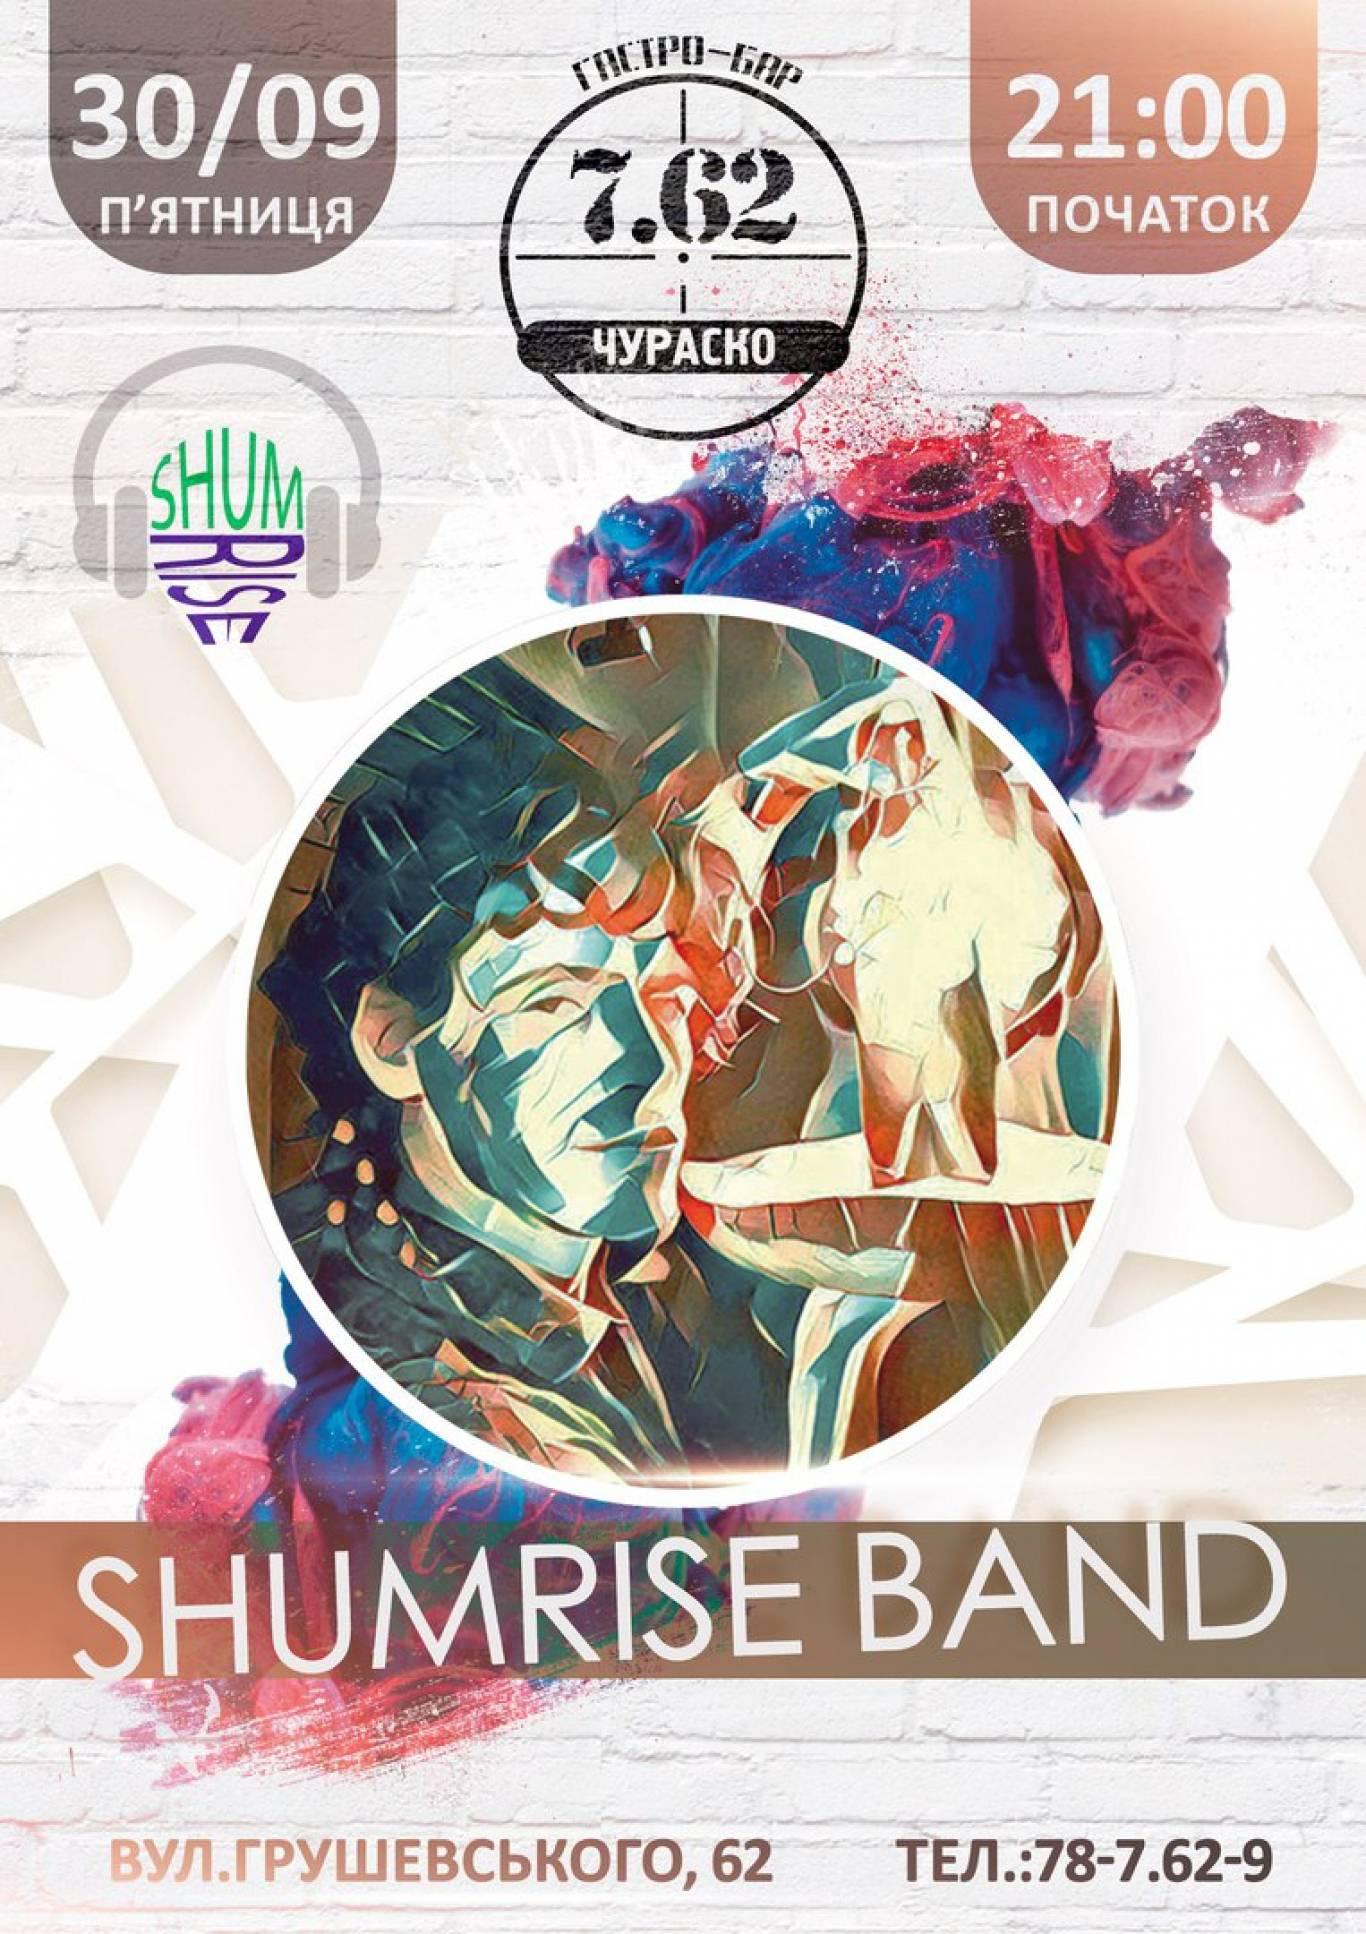 Виступ Shumrise Band